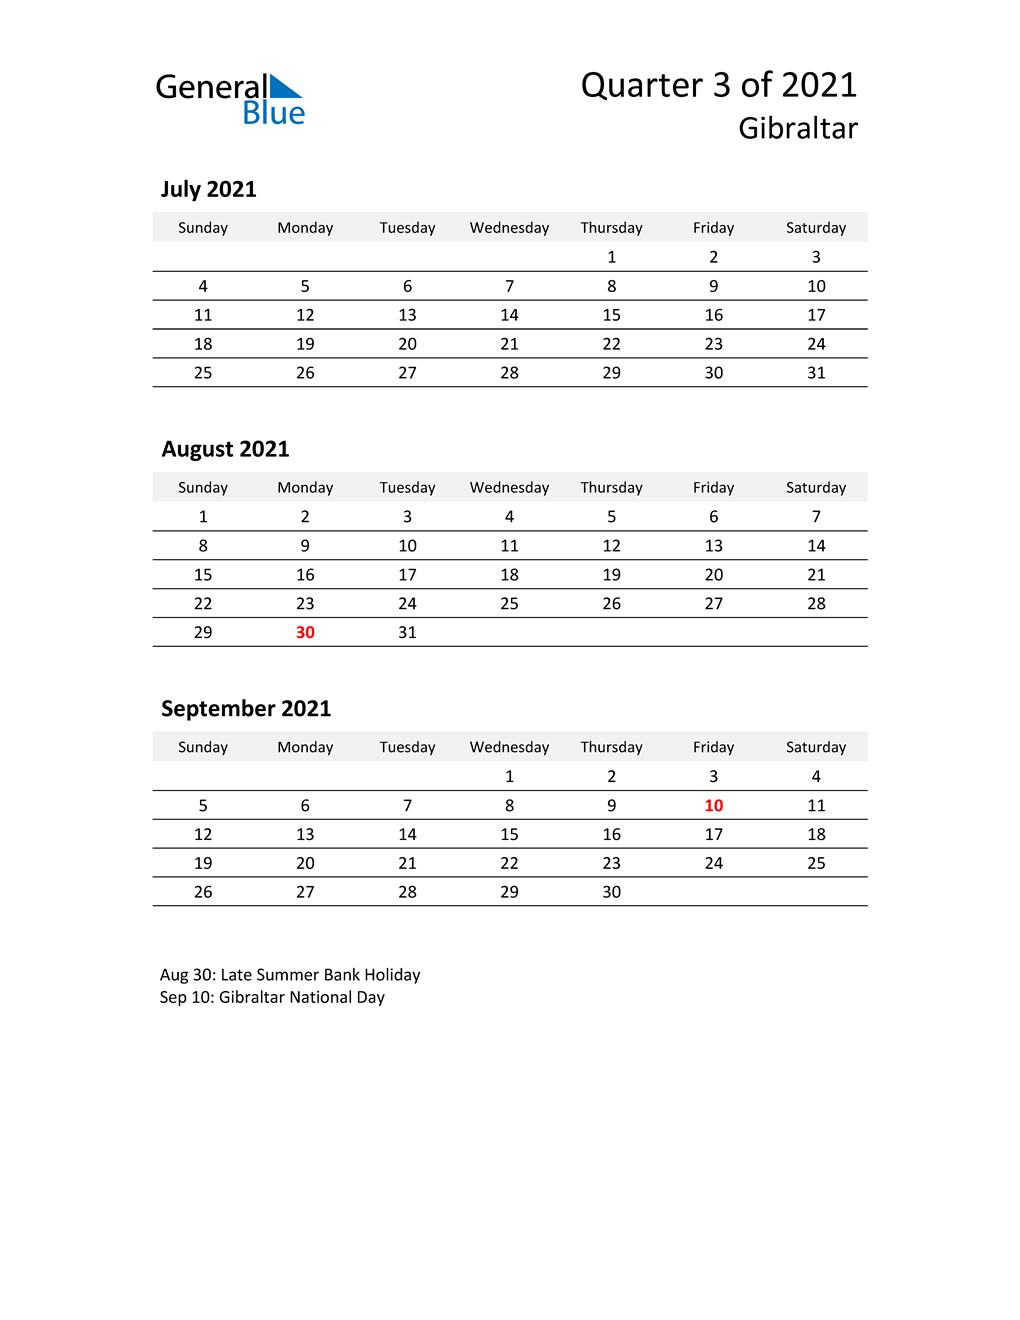 2021 Three-Month Calendar for Gibraltar